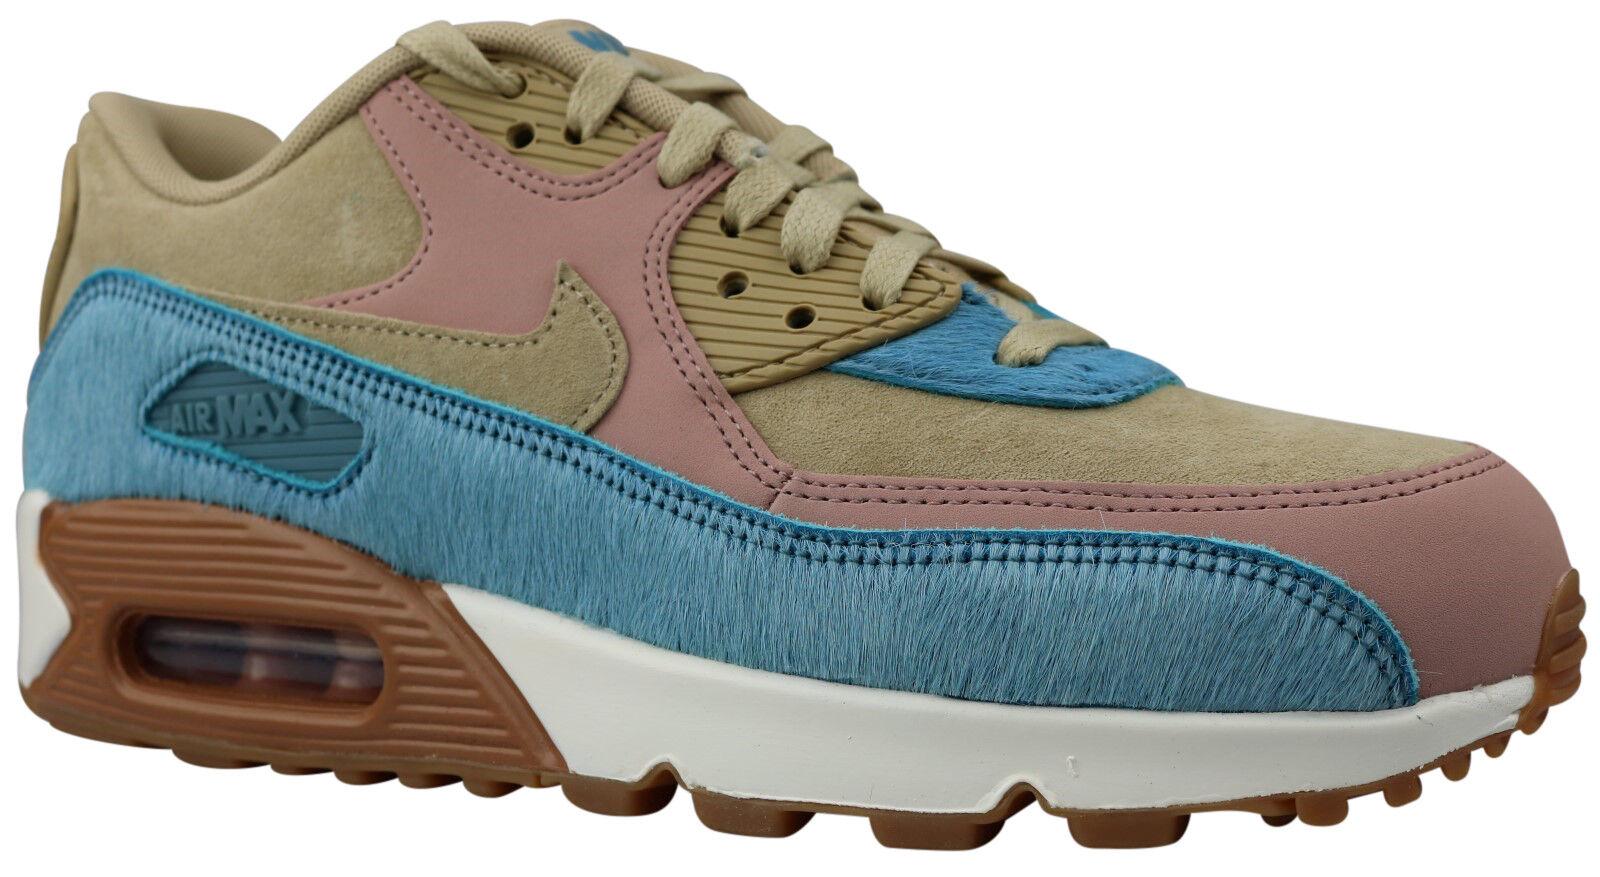 Nike Schuhe Wmns AIR MAX 90 LX Damen Sneaker Schuhe Nike 898512-200 Gr. 36 - 40,5 NEU & OVP aa868e